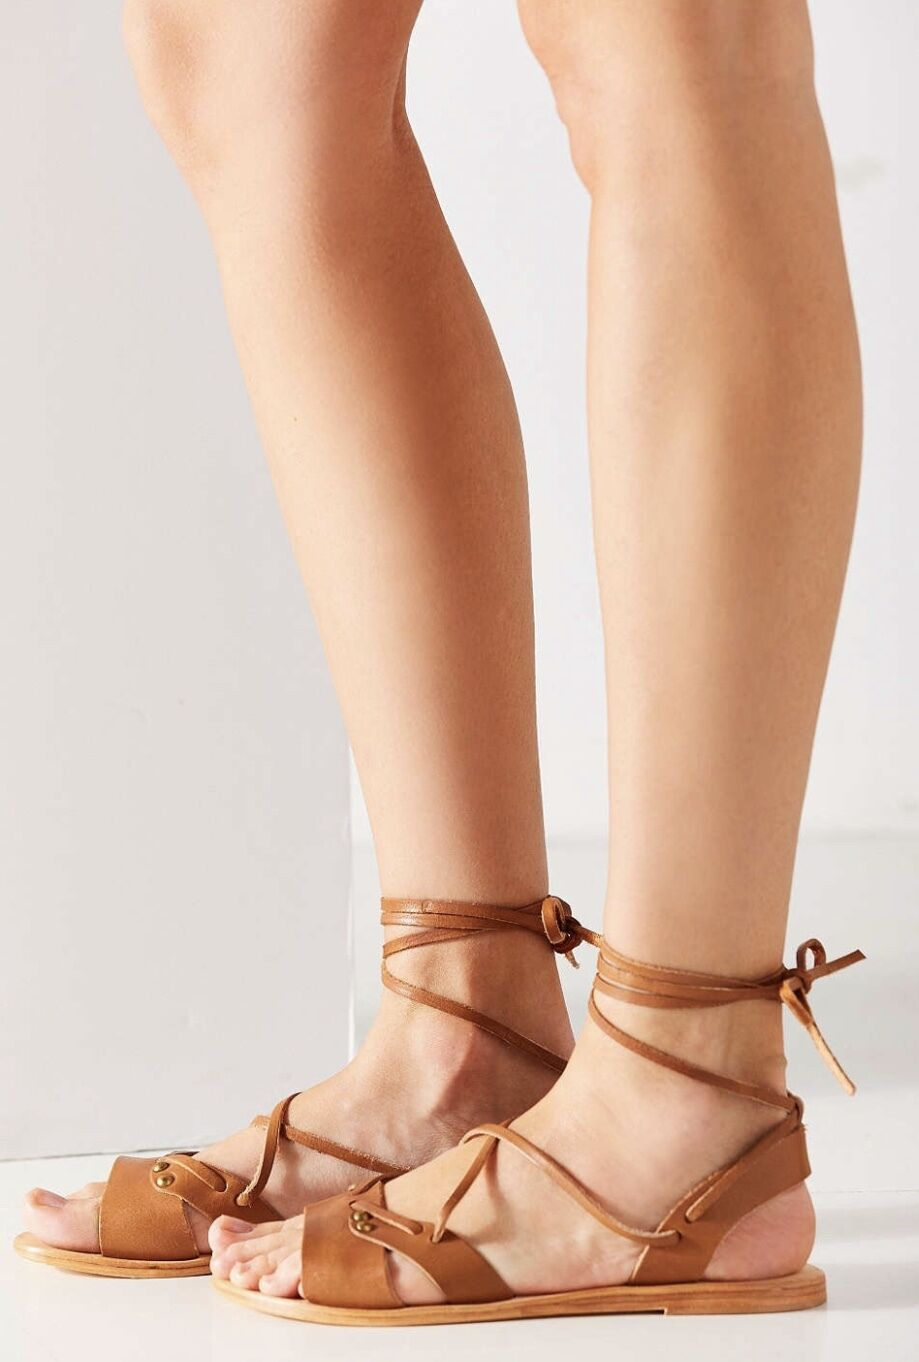 NEU Urban Outfitters Urge tan Leder Ankle Tie Sandales 39 / 8 - 8.5